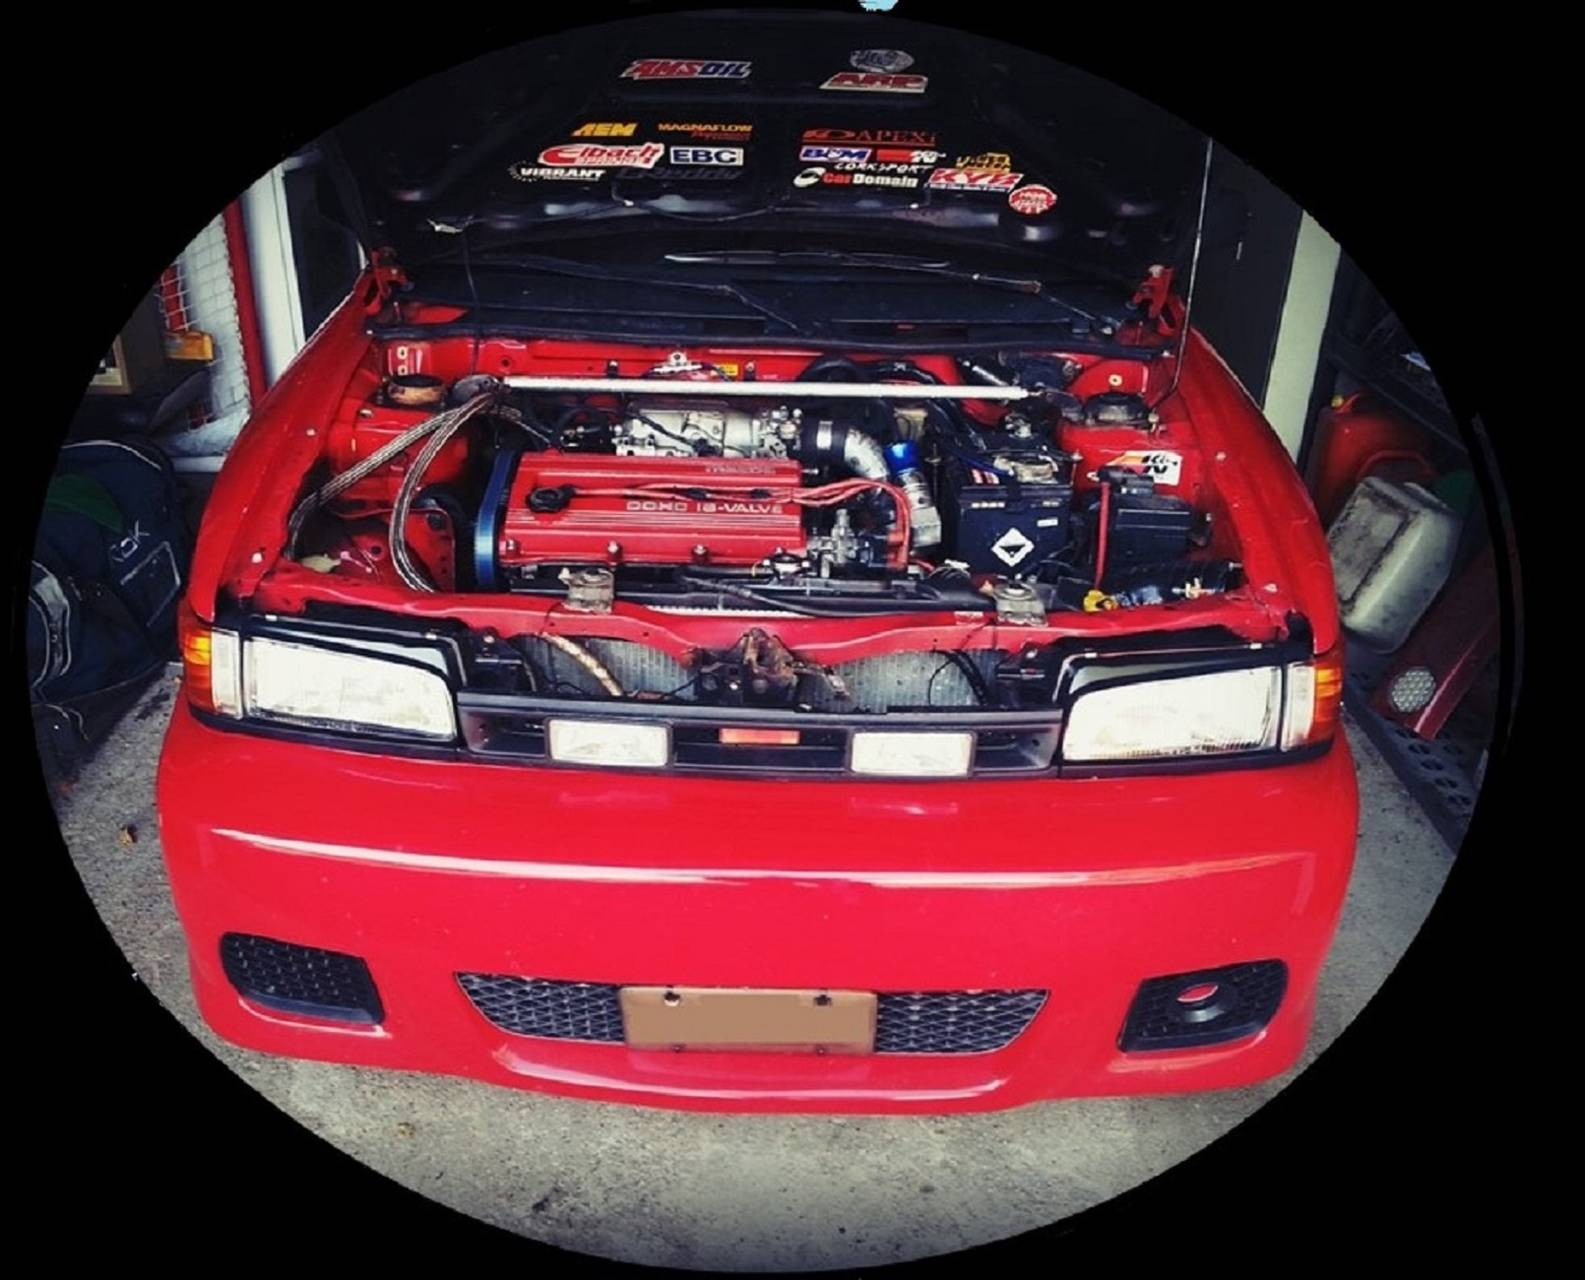 Mazda 323 show